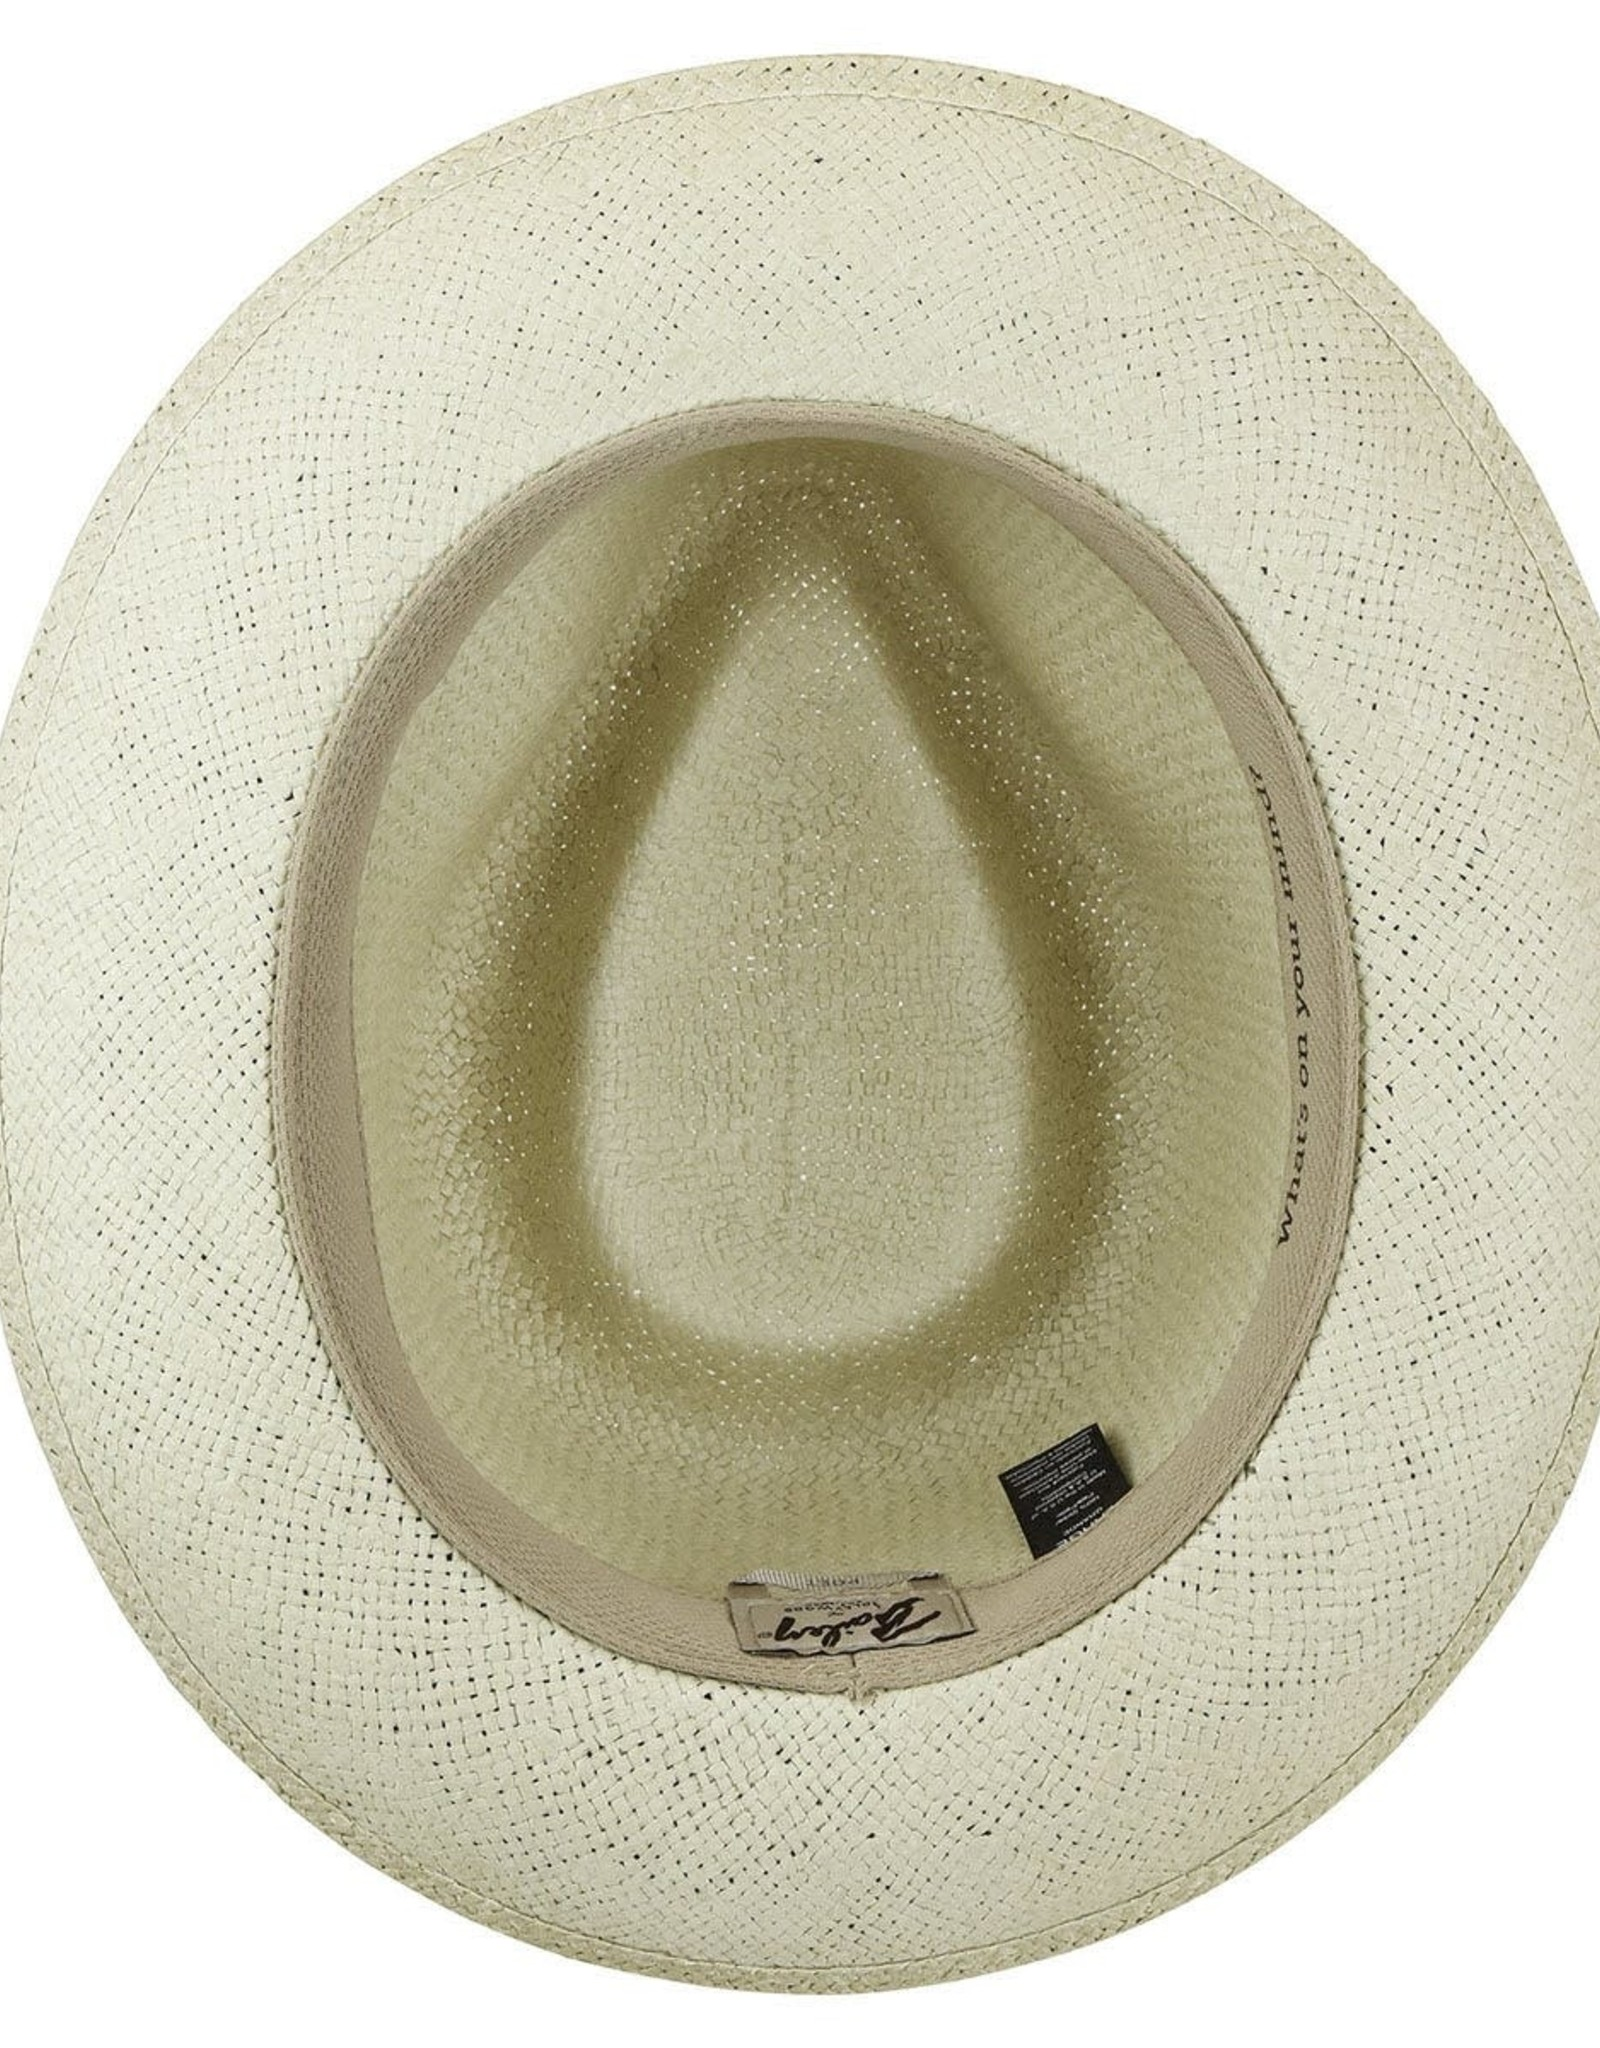 Bailey Hat Co. HAT-FEDORA-OUTEN, STRAW